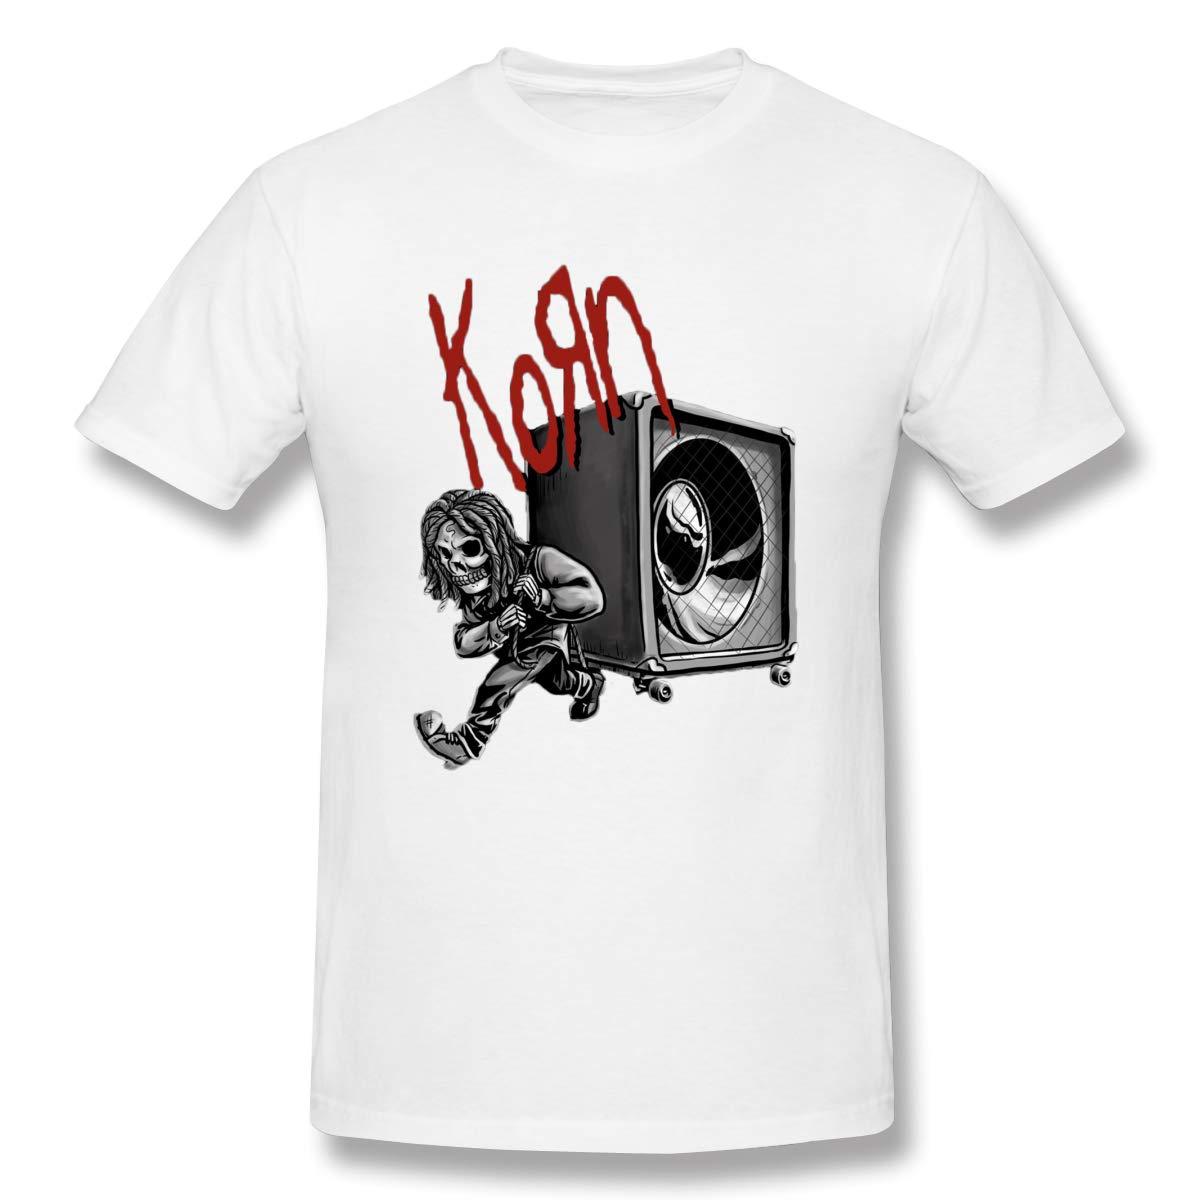 Heavy Metal BandsMens Basic Short Sleeve T-Shirt White Qinhuangdao Pin by Nathan VanNest On Korn in 2019 Korn